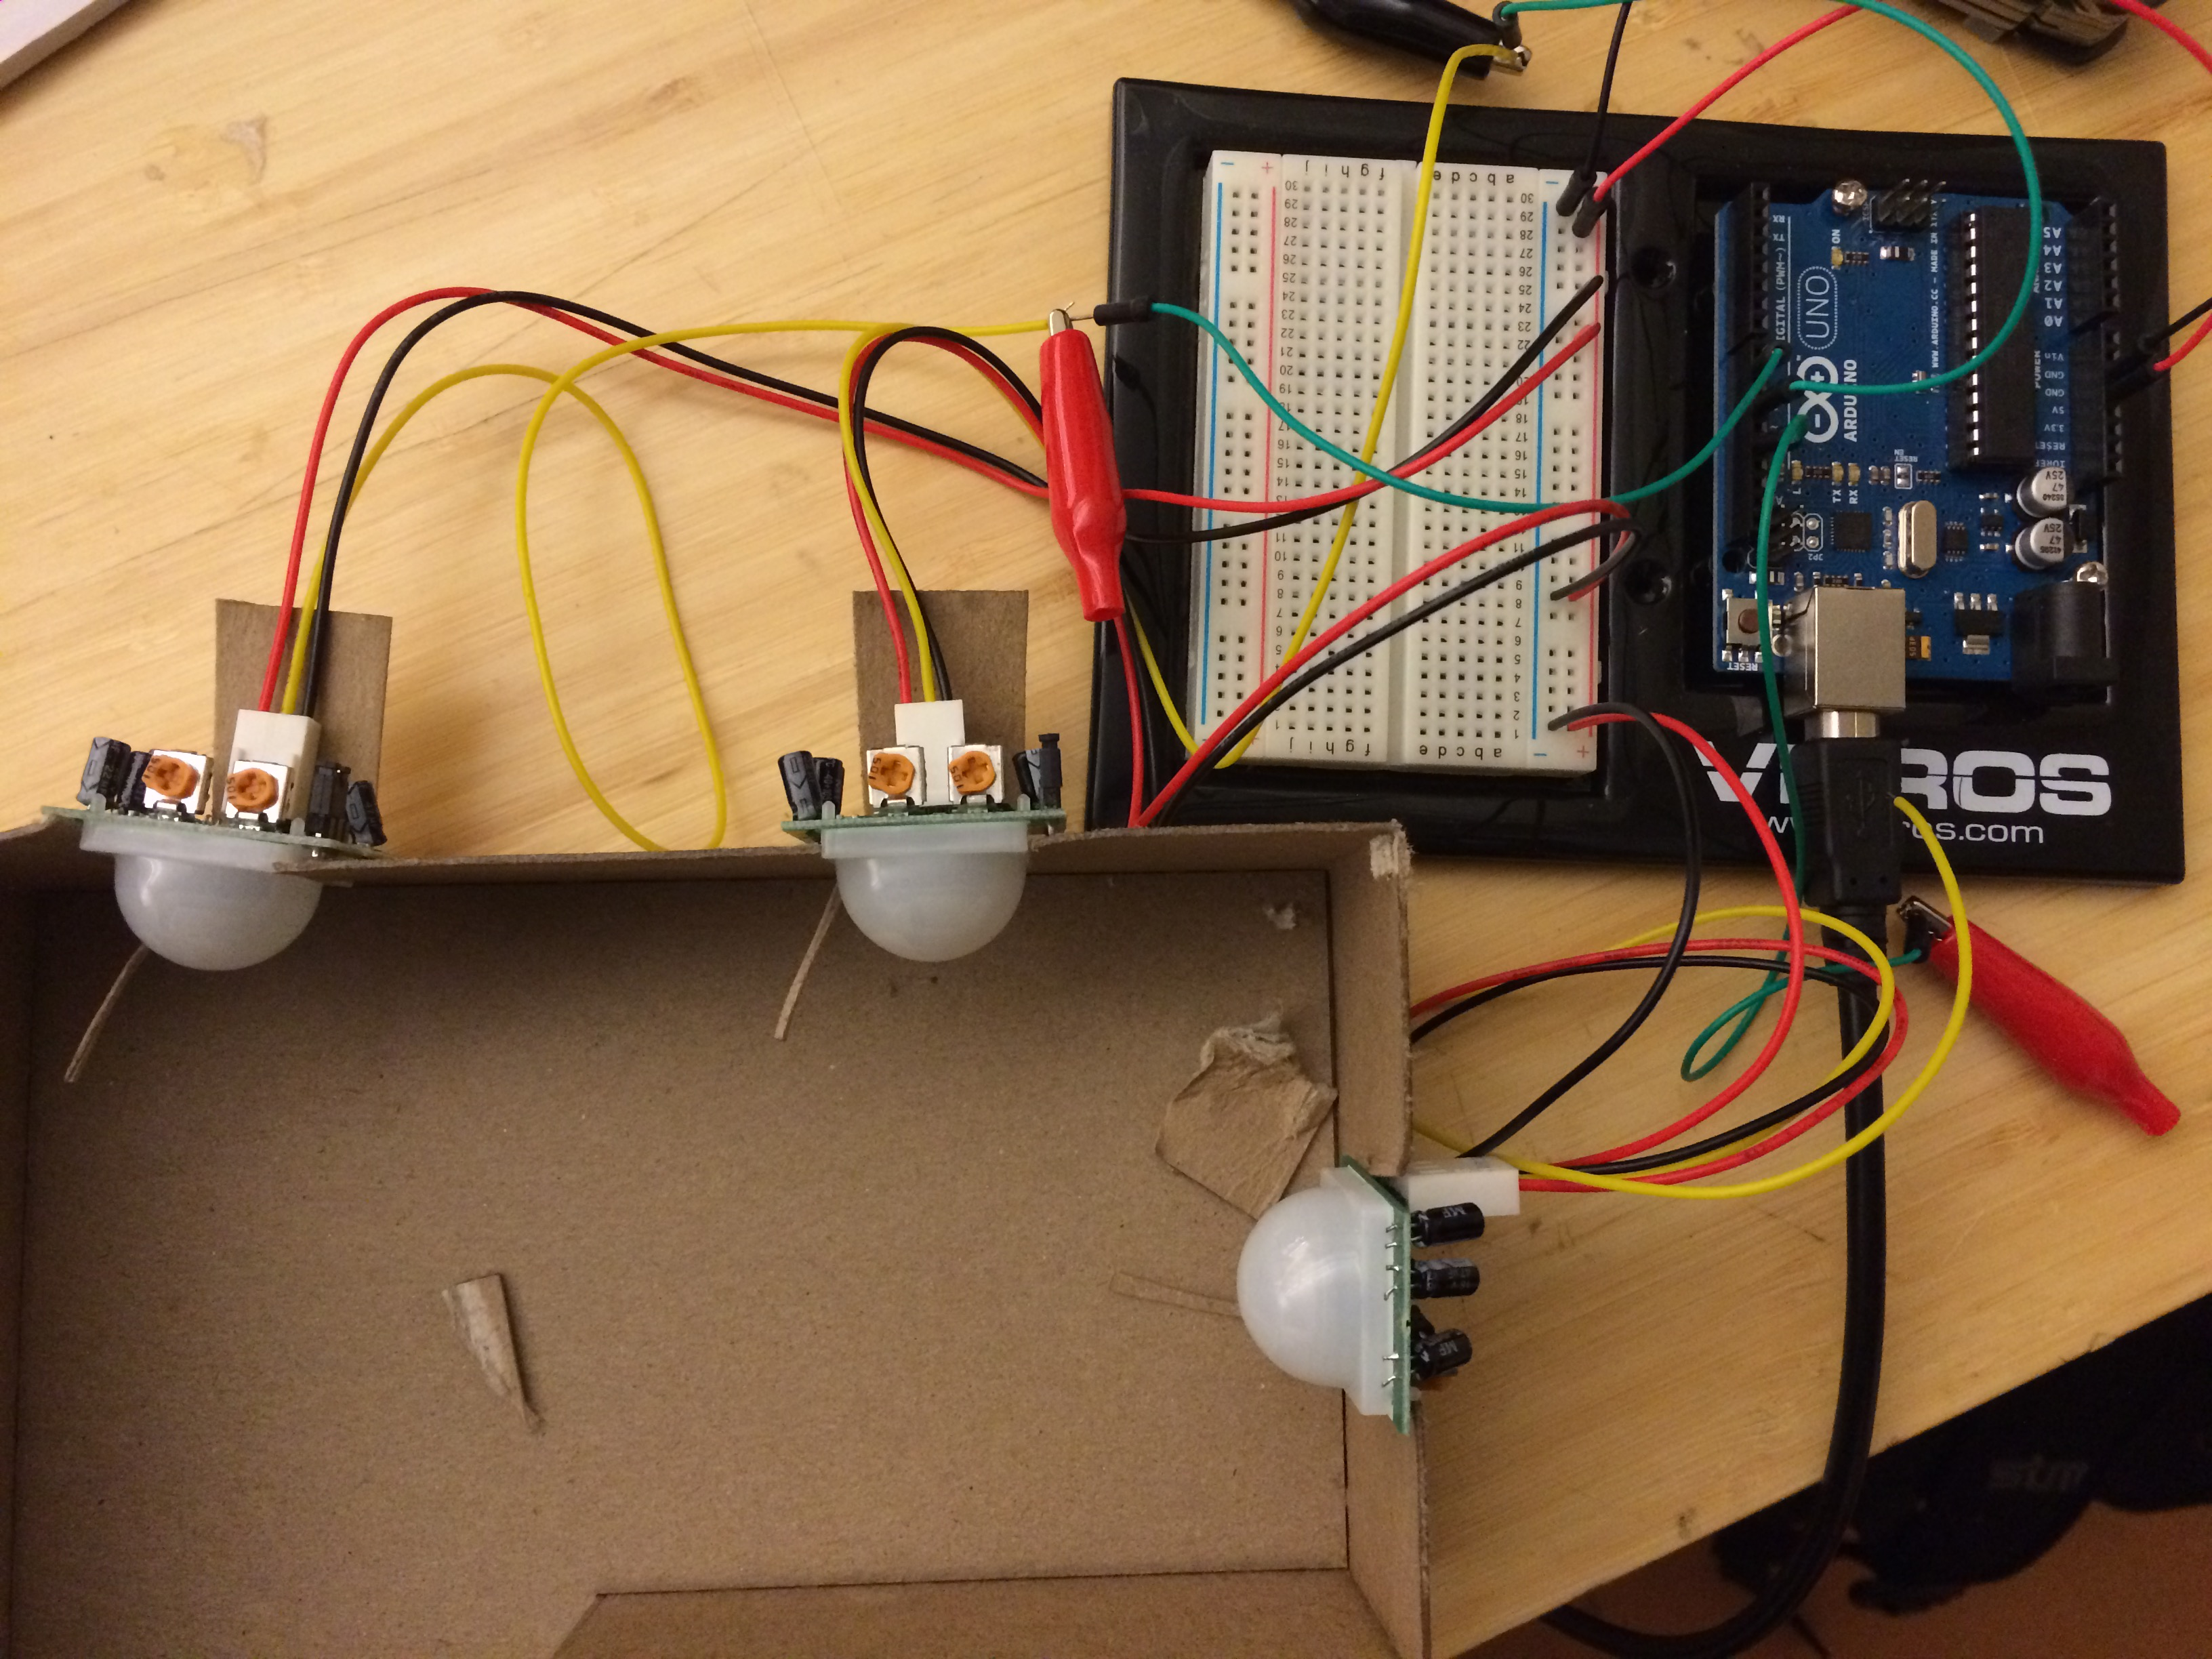 honeywell pir sensor wiring diagram parts of a sailing ship for motion get free image